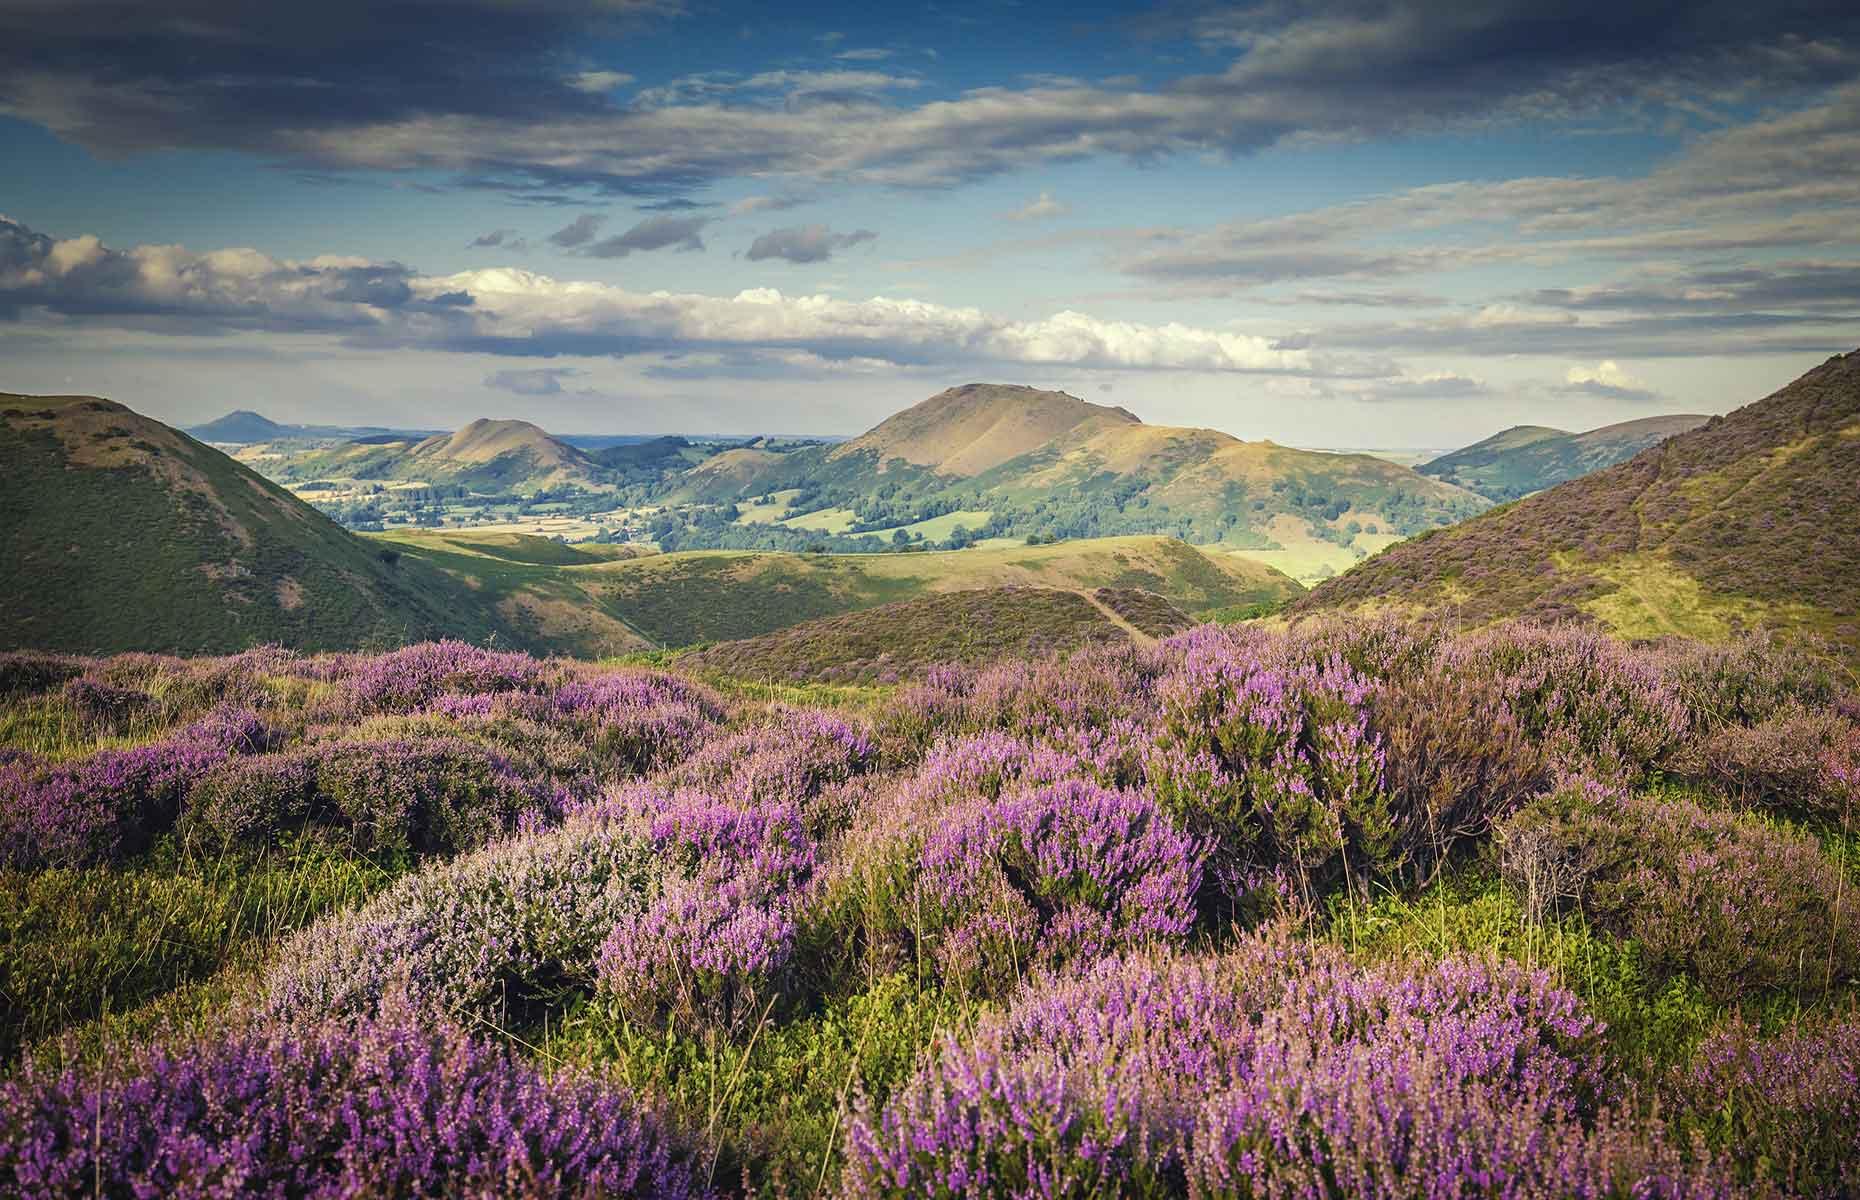 Shropshire Hills (Image: EddieCloud/Shutterstock)